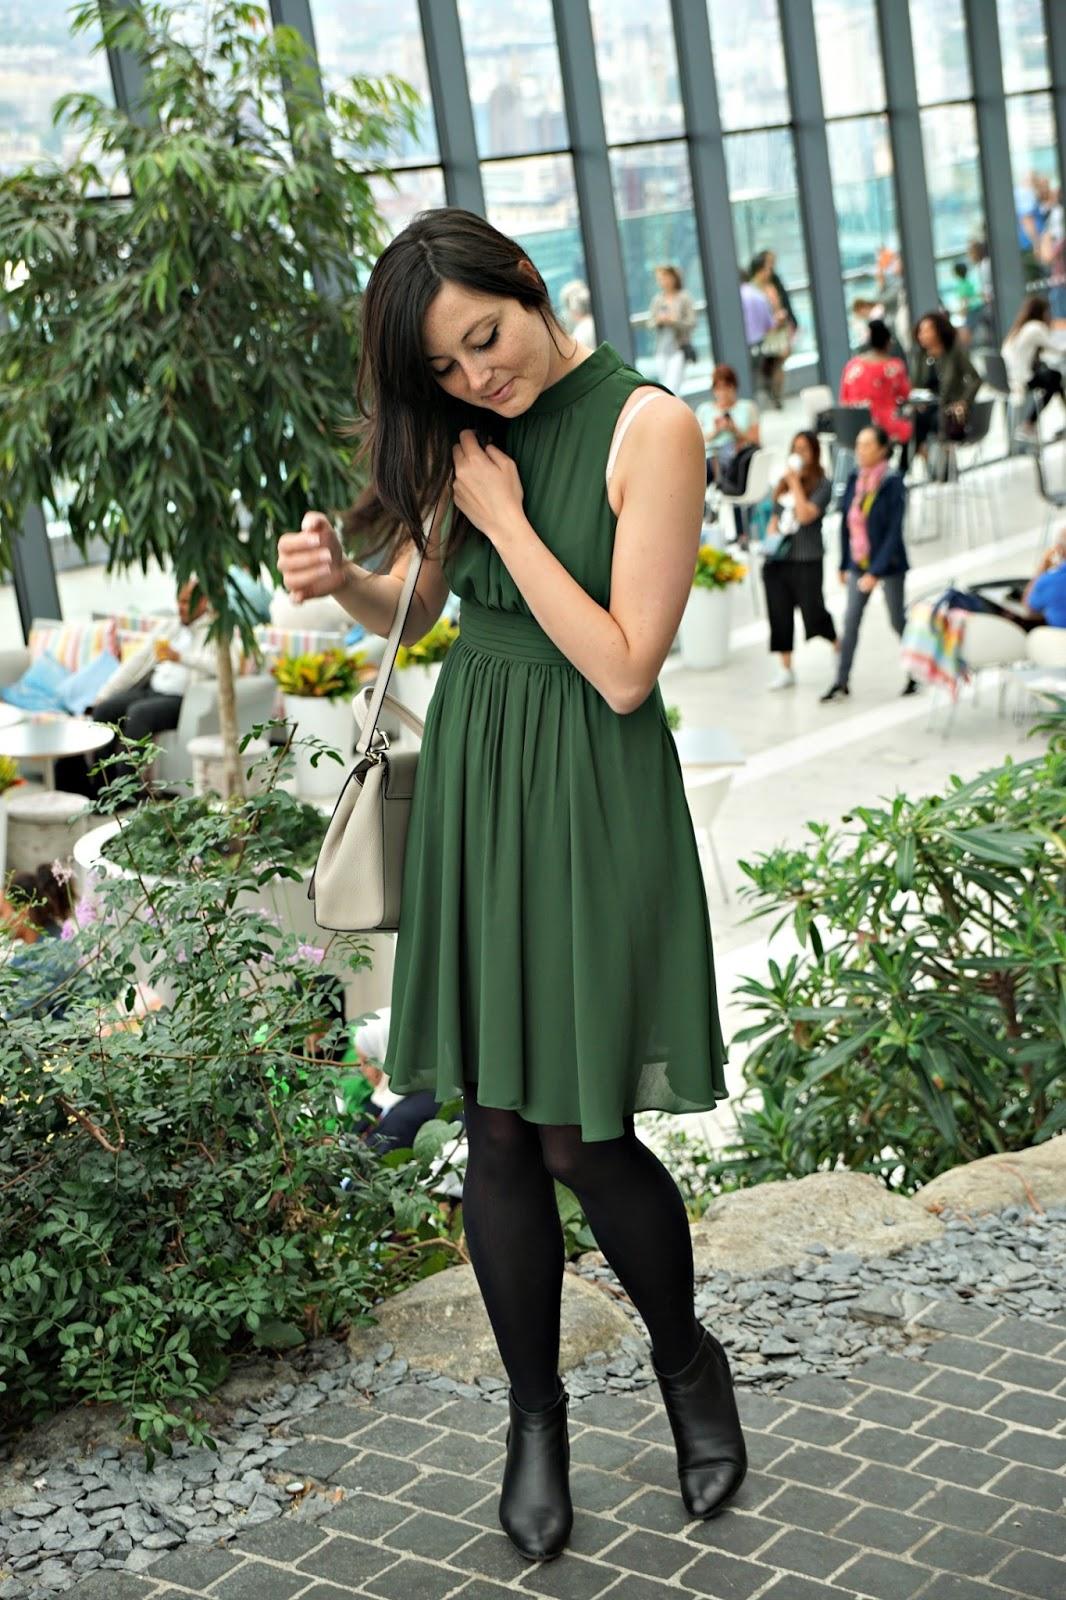 My Green Dress from Zara